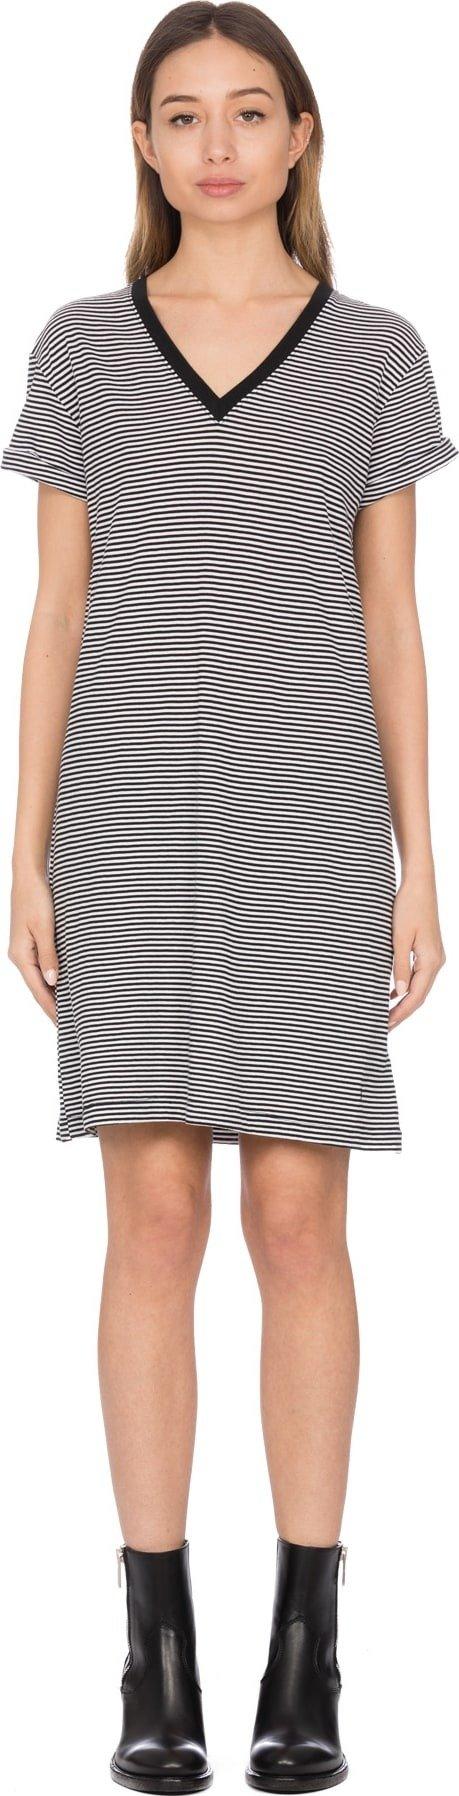 条纹T恤裙